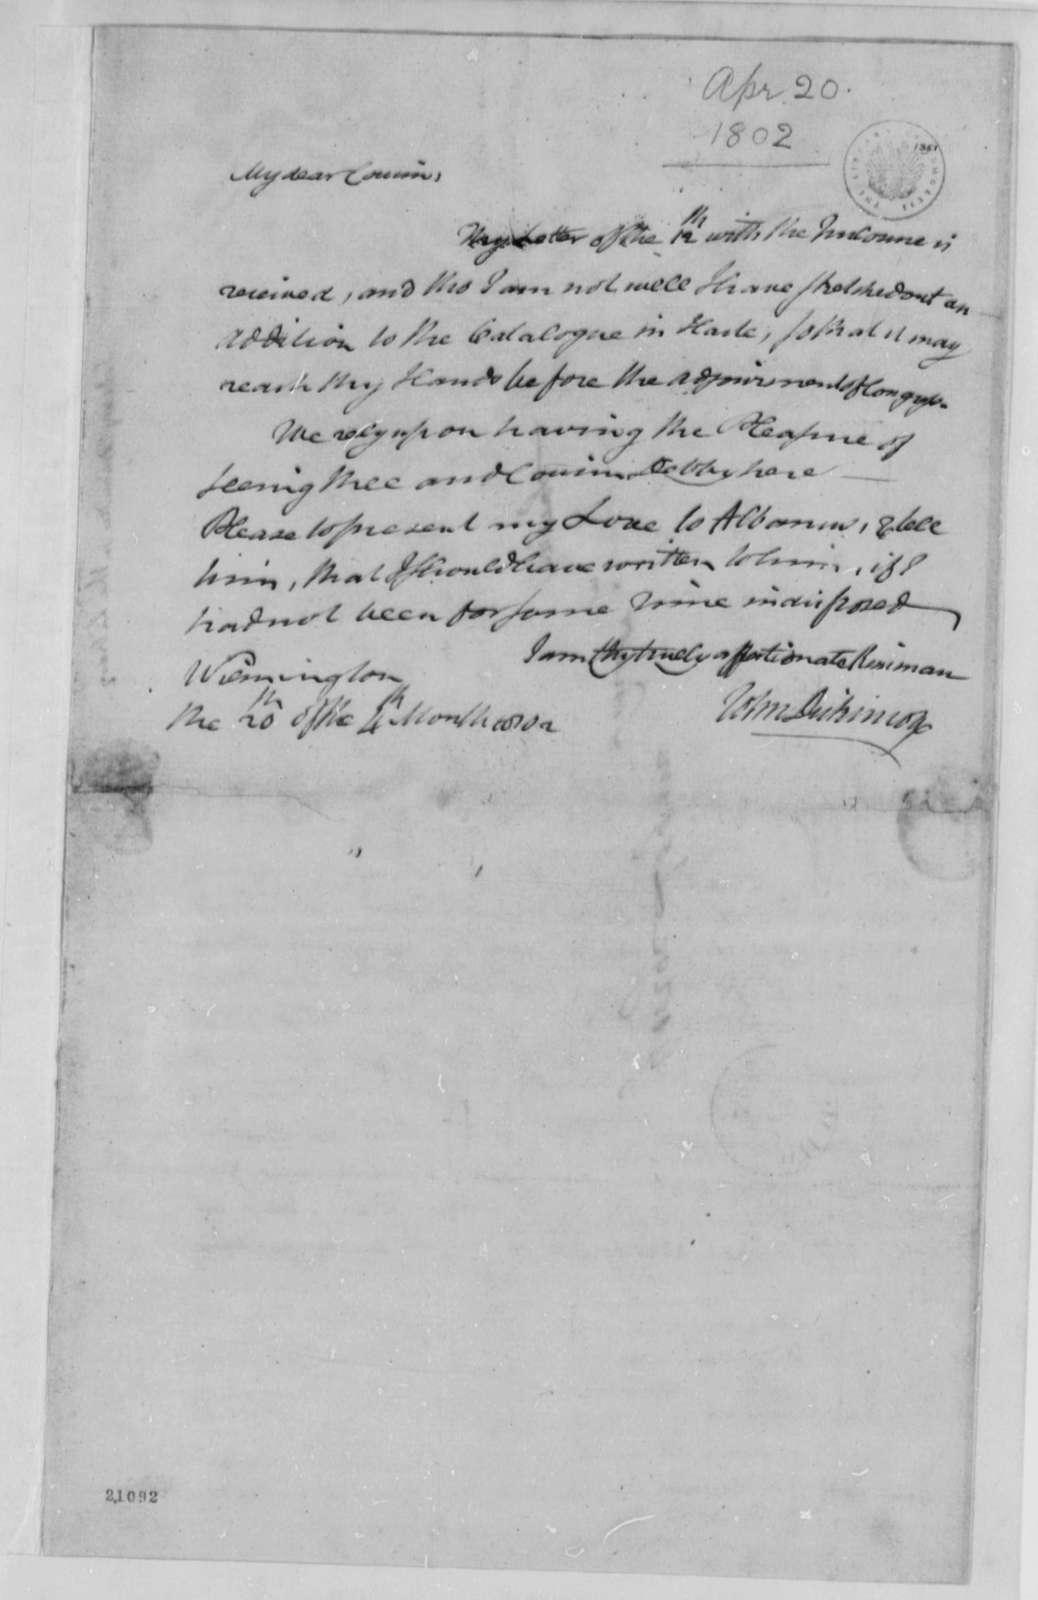 John Dickinson to George Logan, April 20, 1802, List